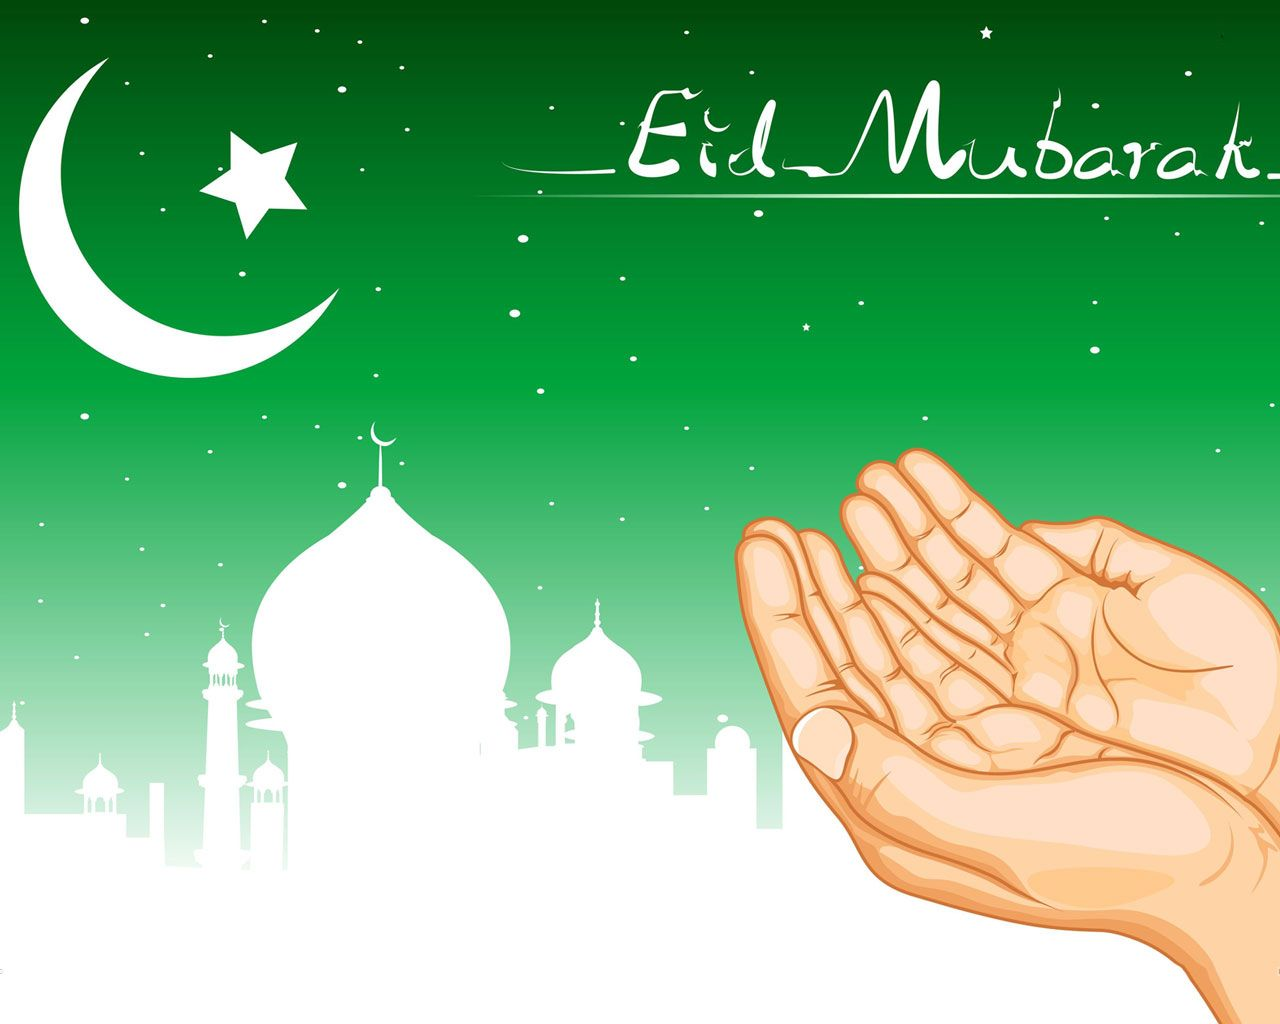 Eid Mubarak Wishes For Lover Free Download Eid Mubarak Images Eid Mubarak Eid Mubarak Wishes